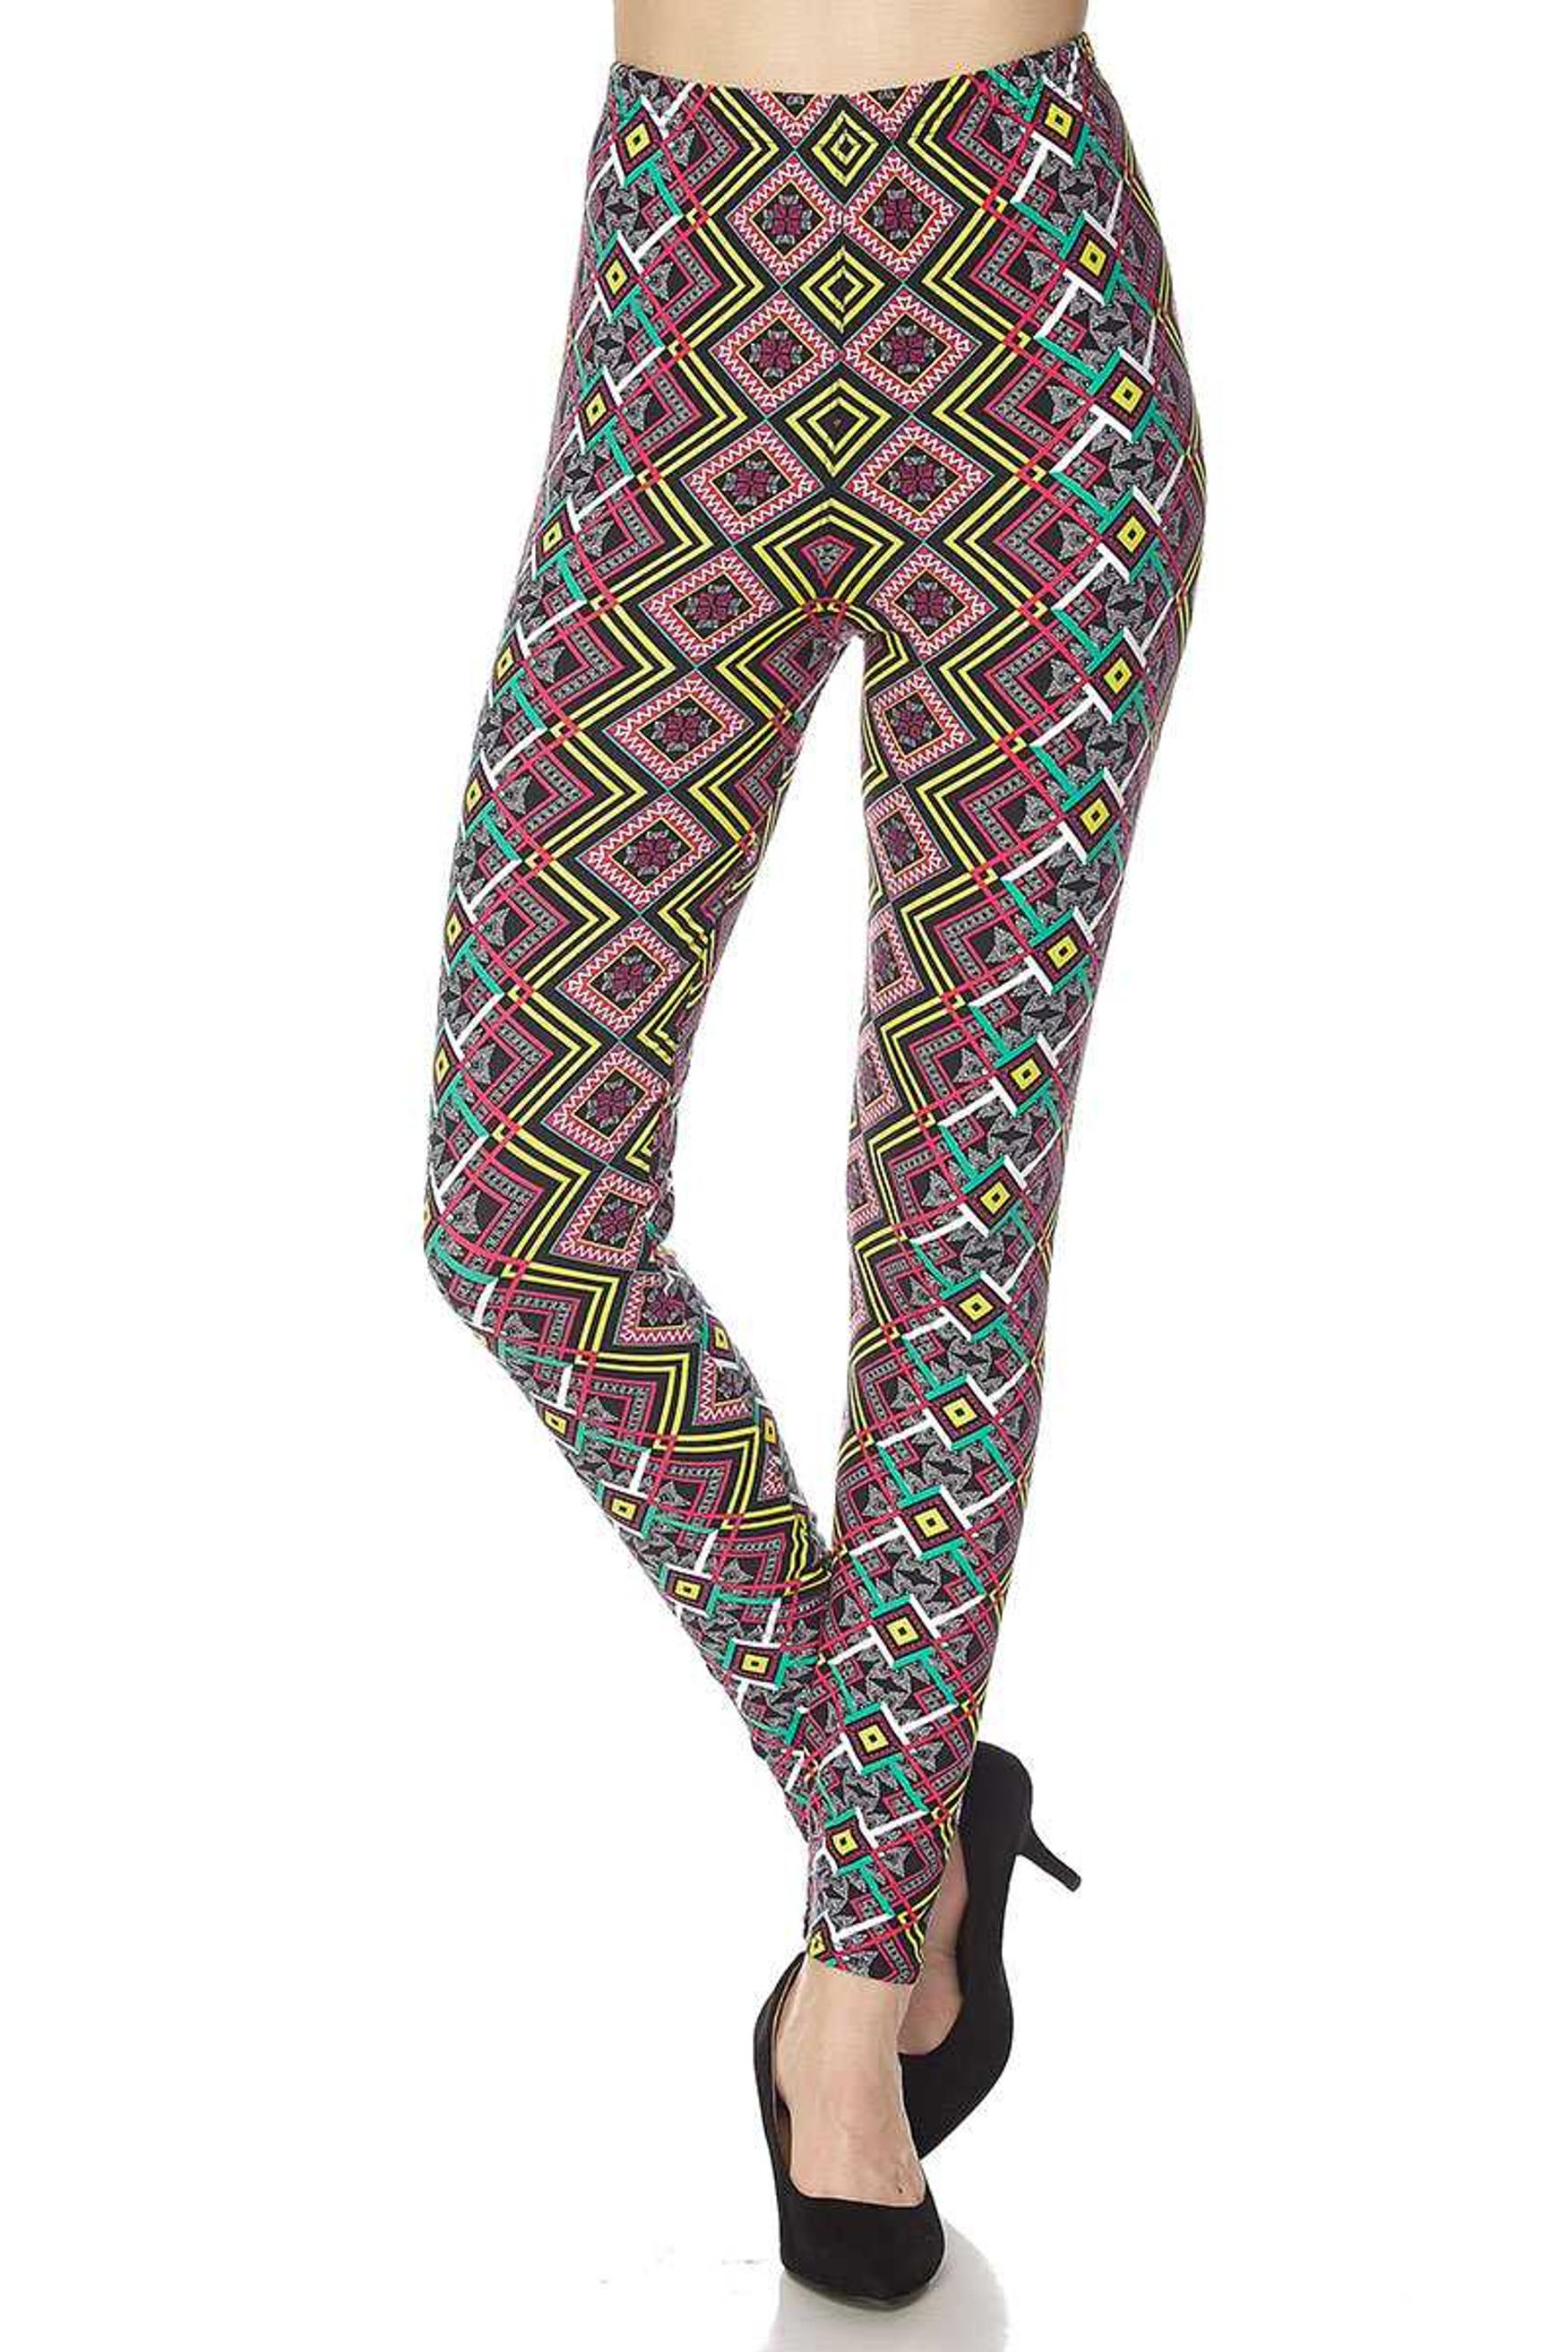 Brushed Angled Colorful Symmetry Plus Size Leggings